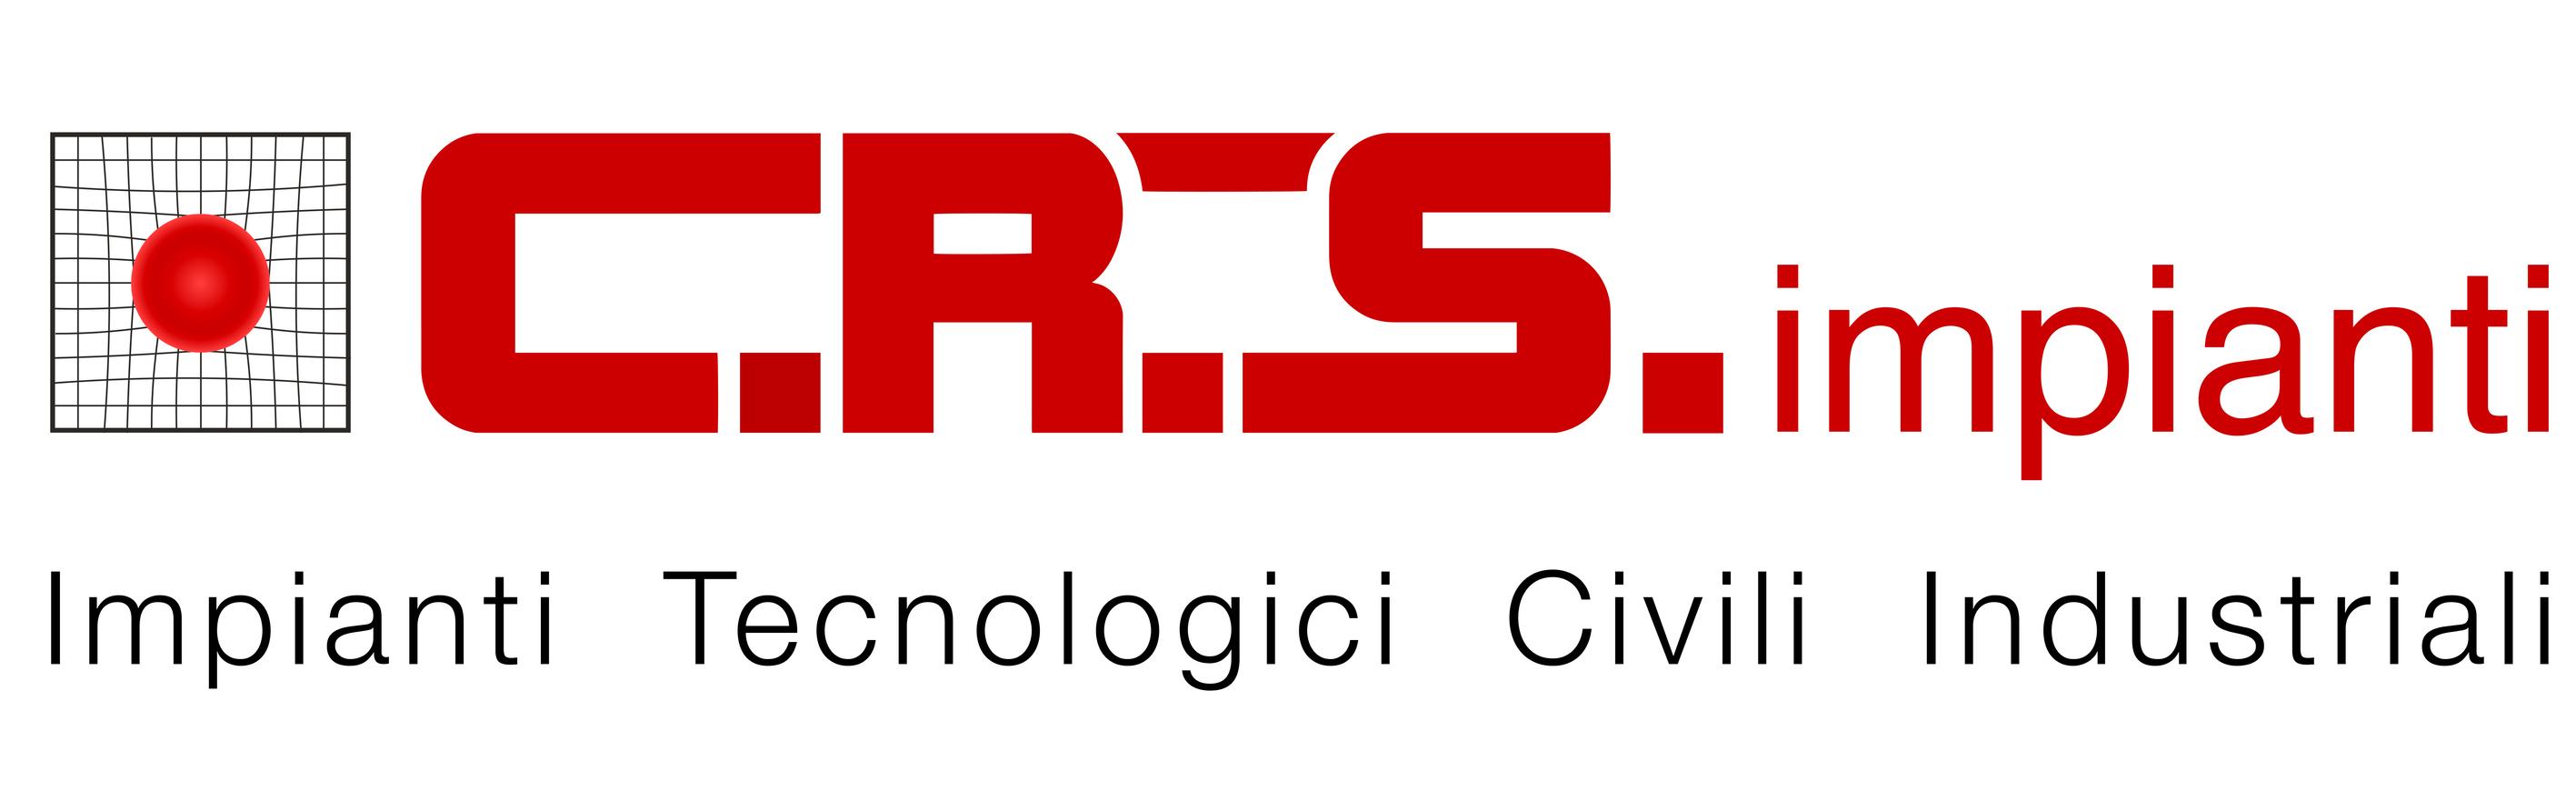 Bildmarke: C.R.S. IMPIANTI IMPIANTI TECNOLOGICI CIVILI INDUSTRIALI